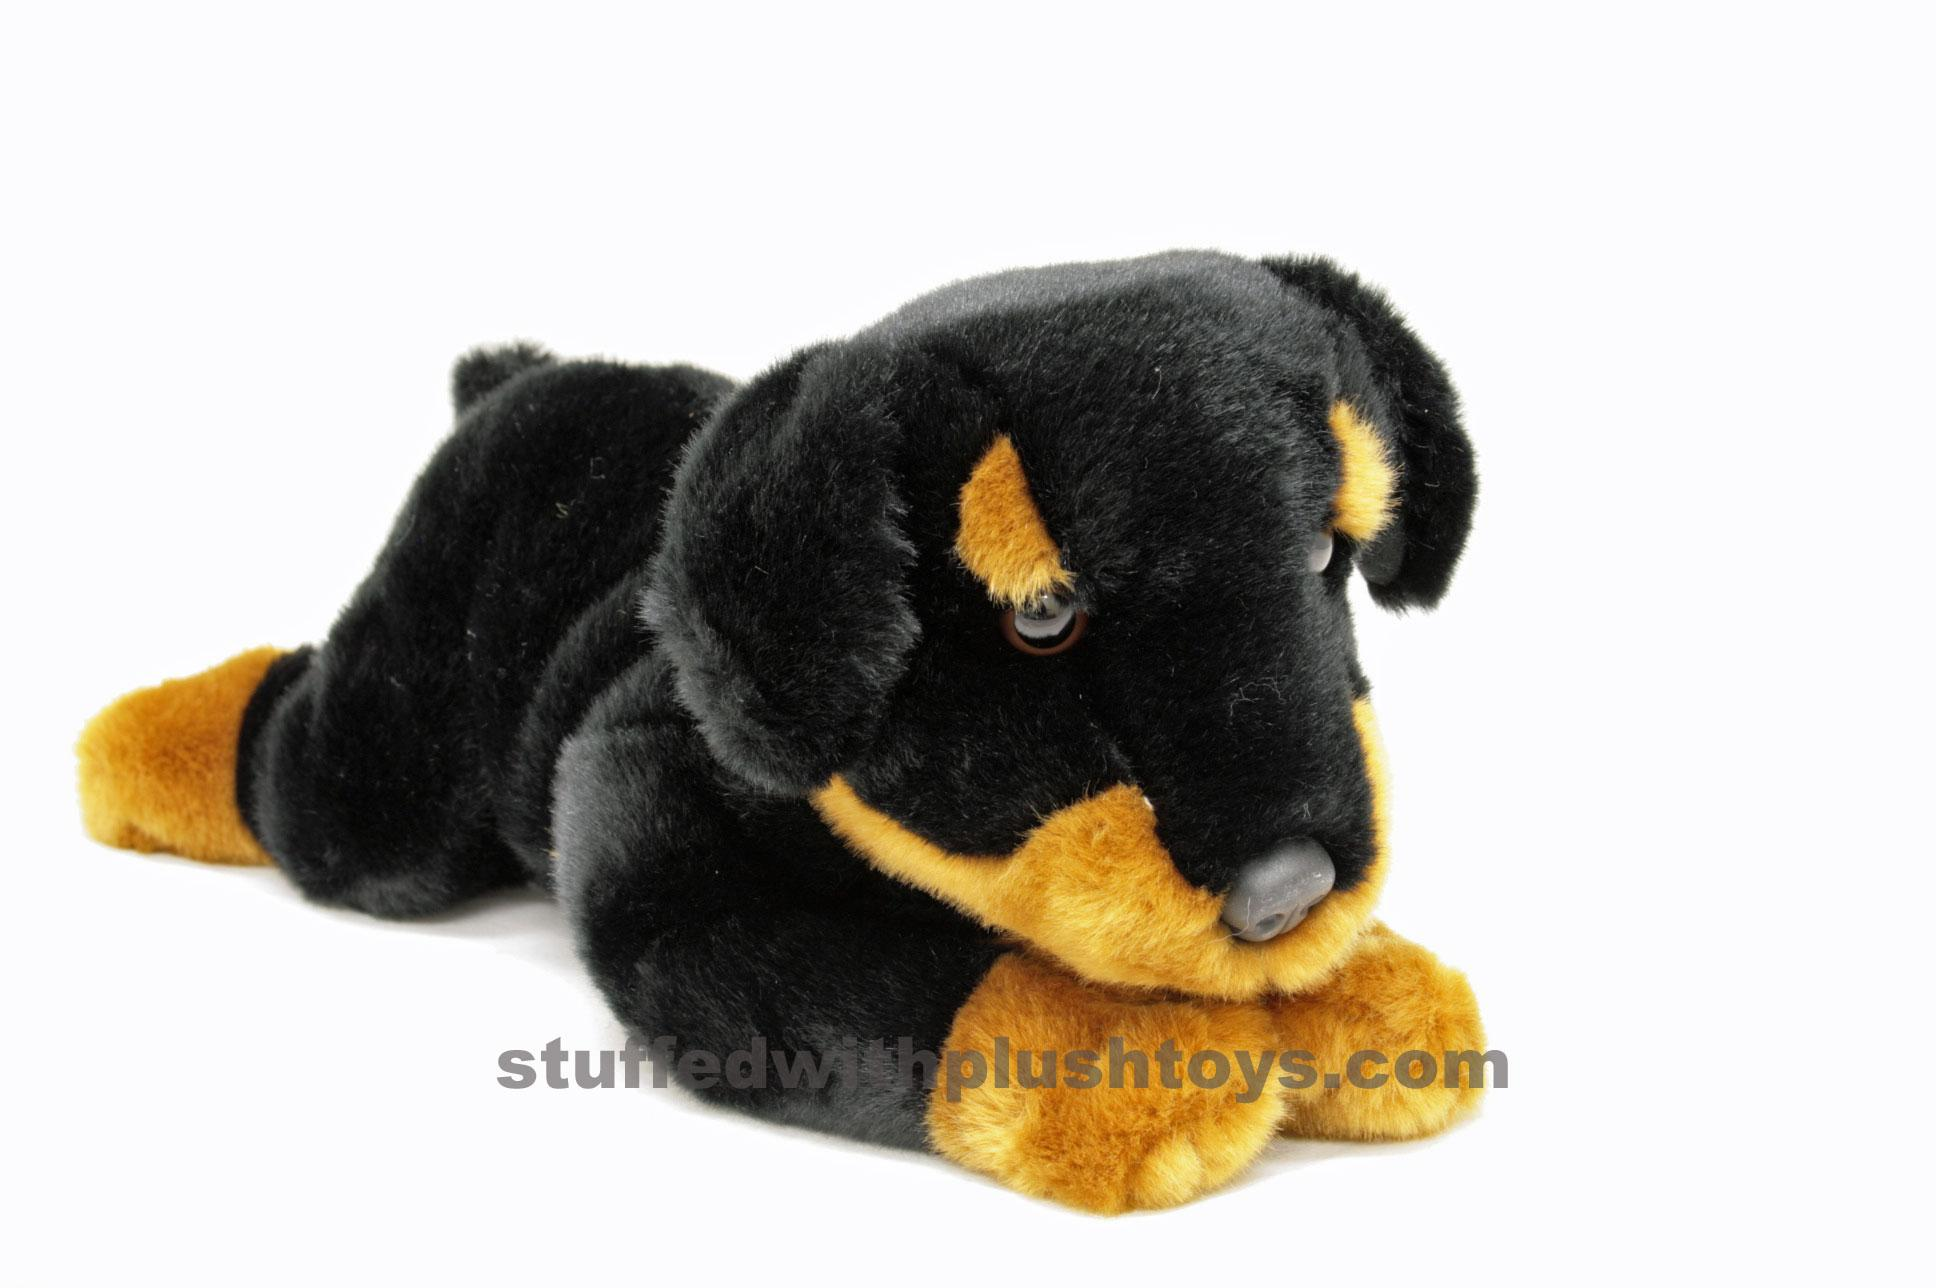 photos compare dog breeds small dog breeds a z smallest dog breeds ...